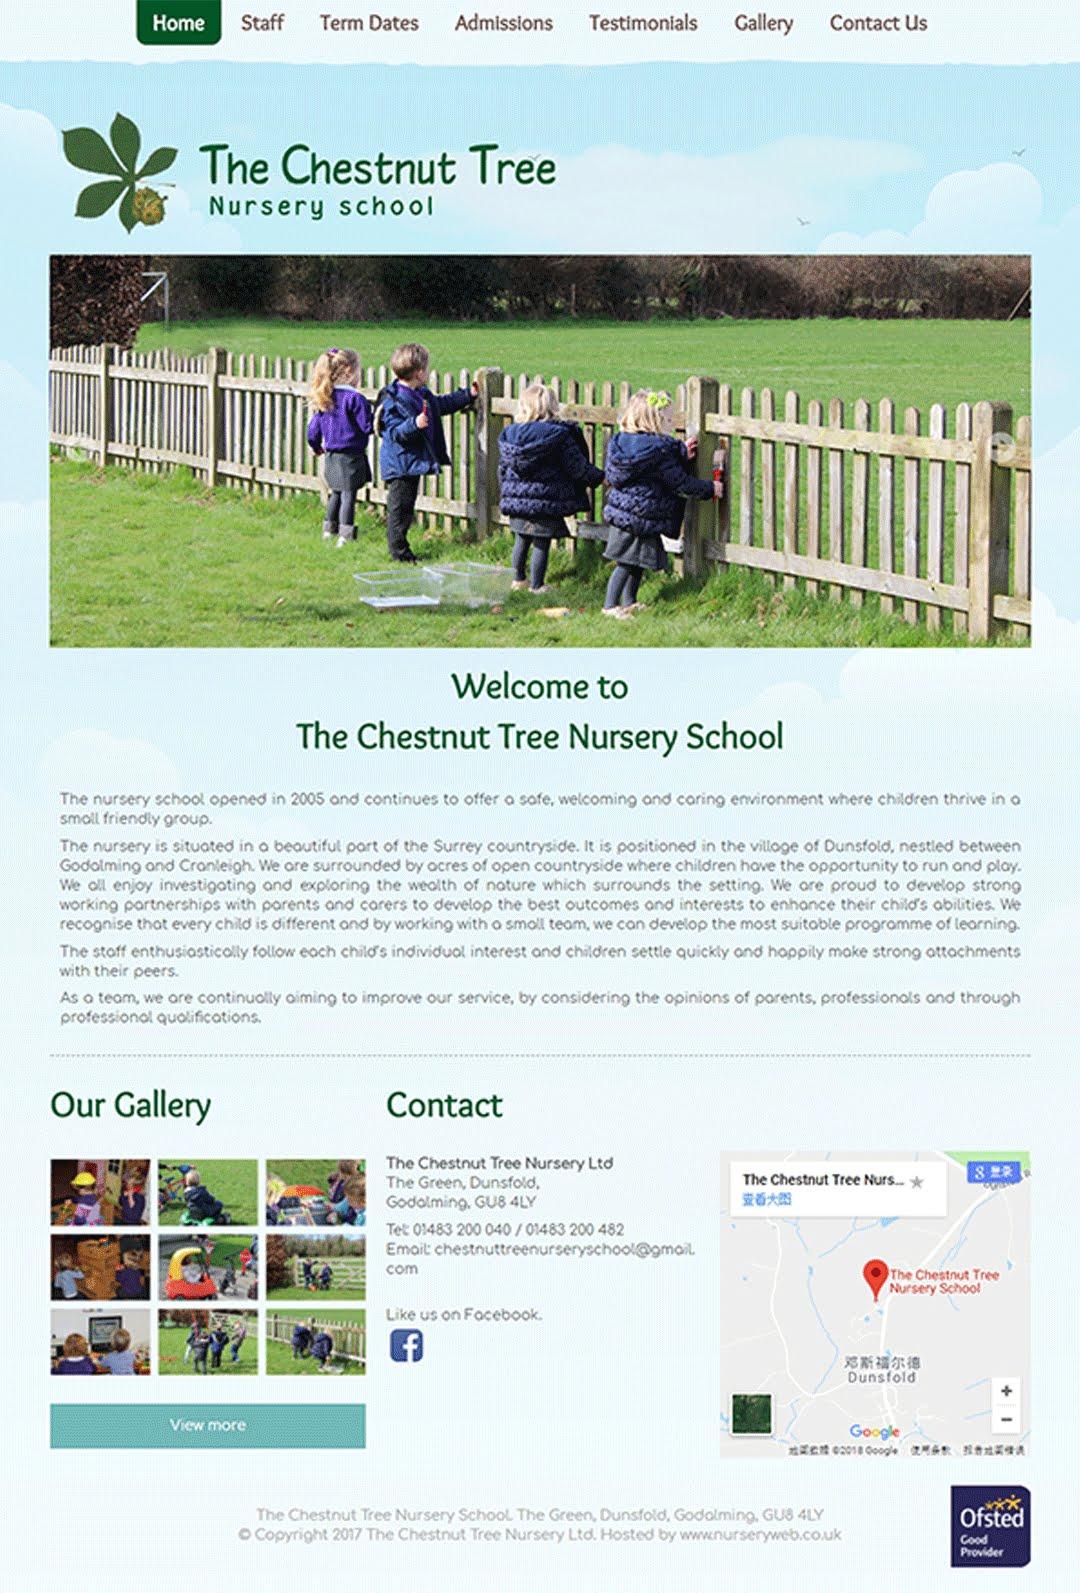 The Chestnut Tree Nursery School